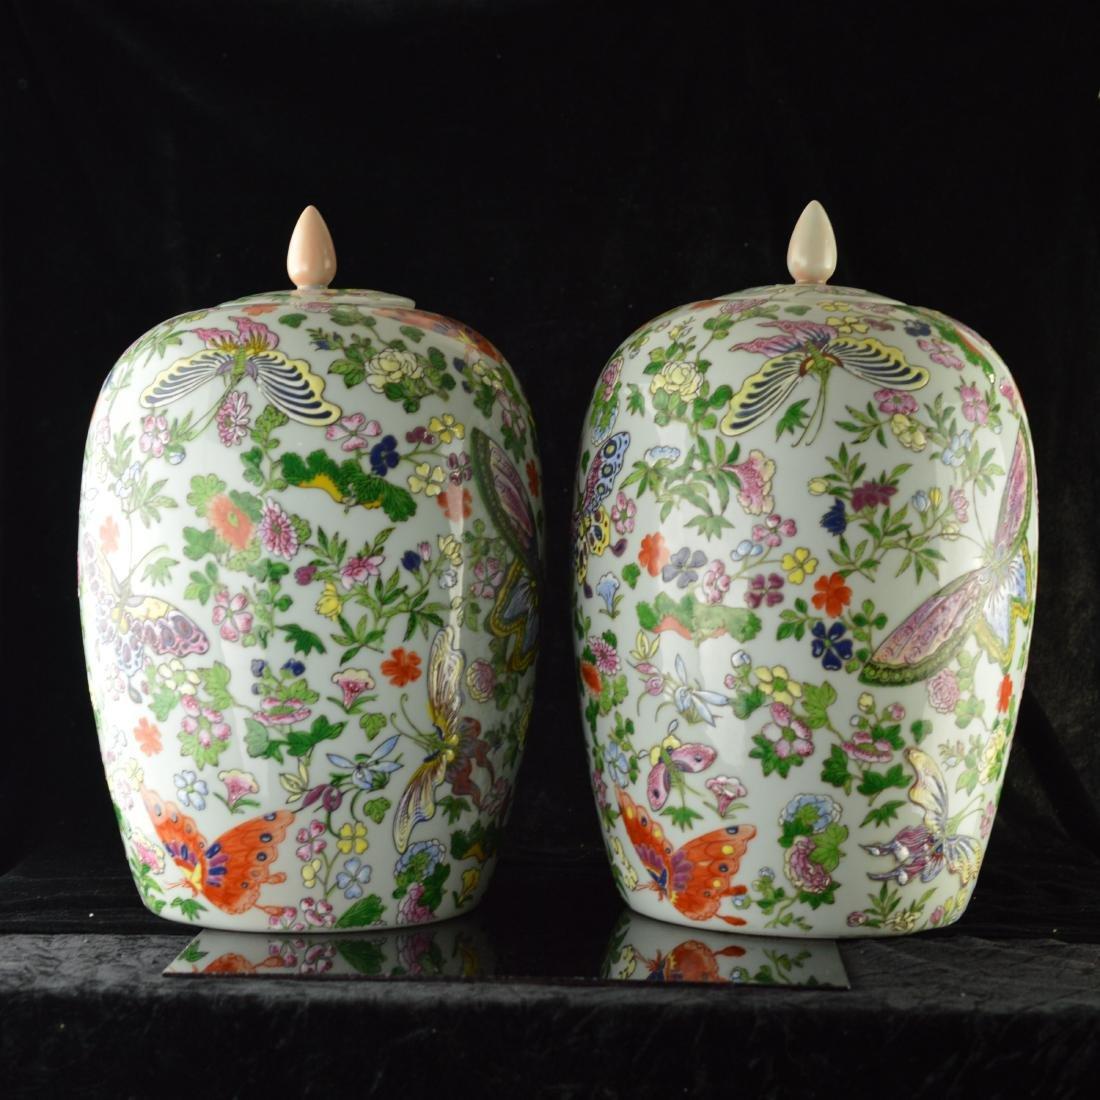 Pair of Fen cai butterfly wintermelon jar